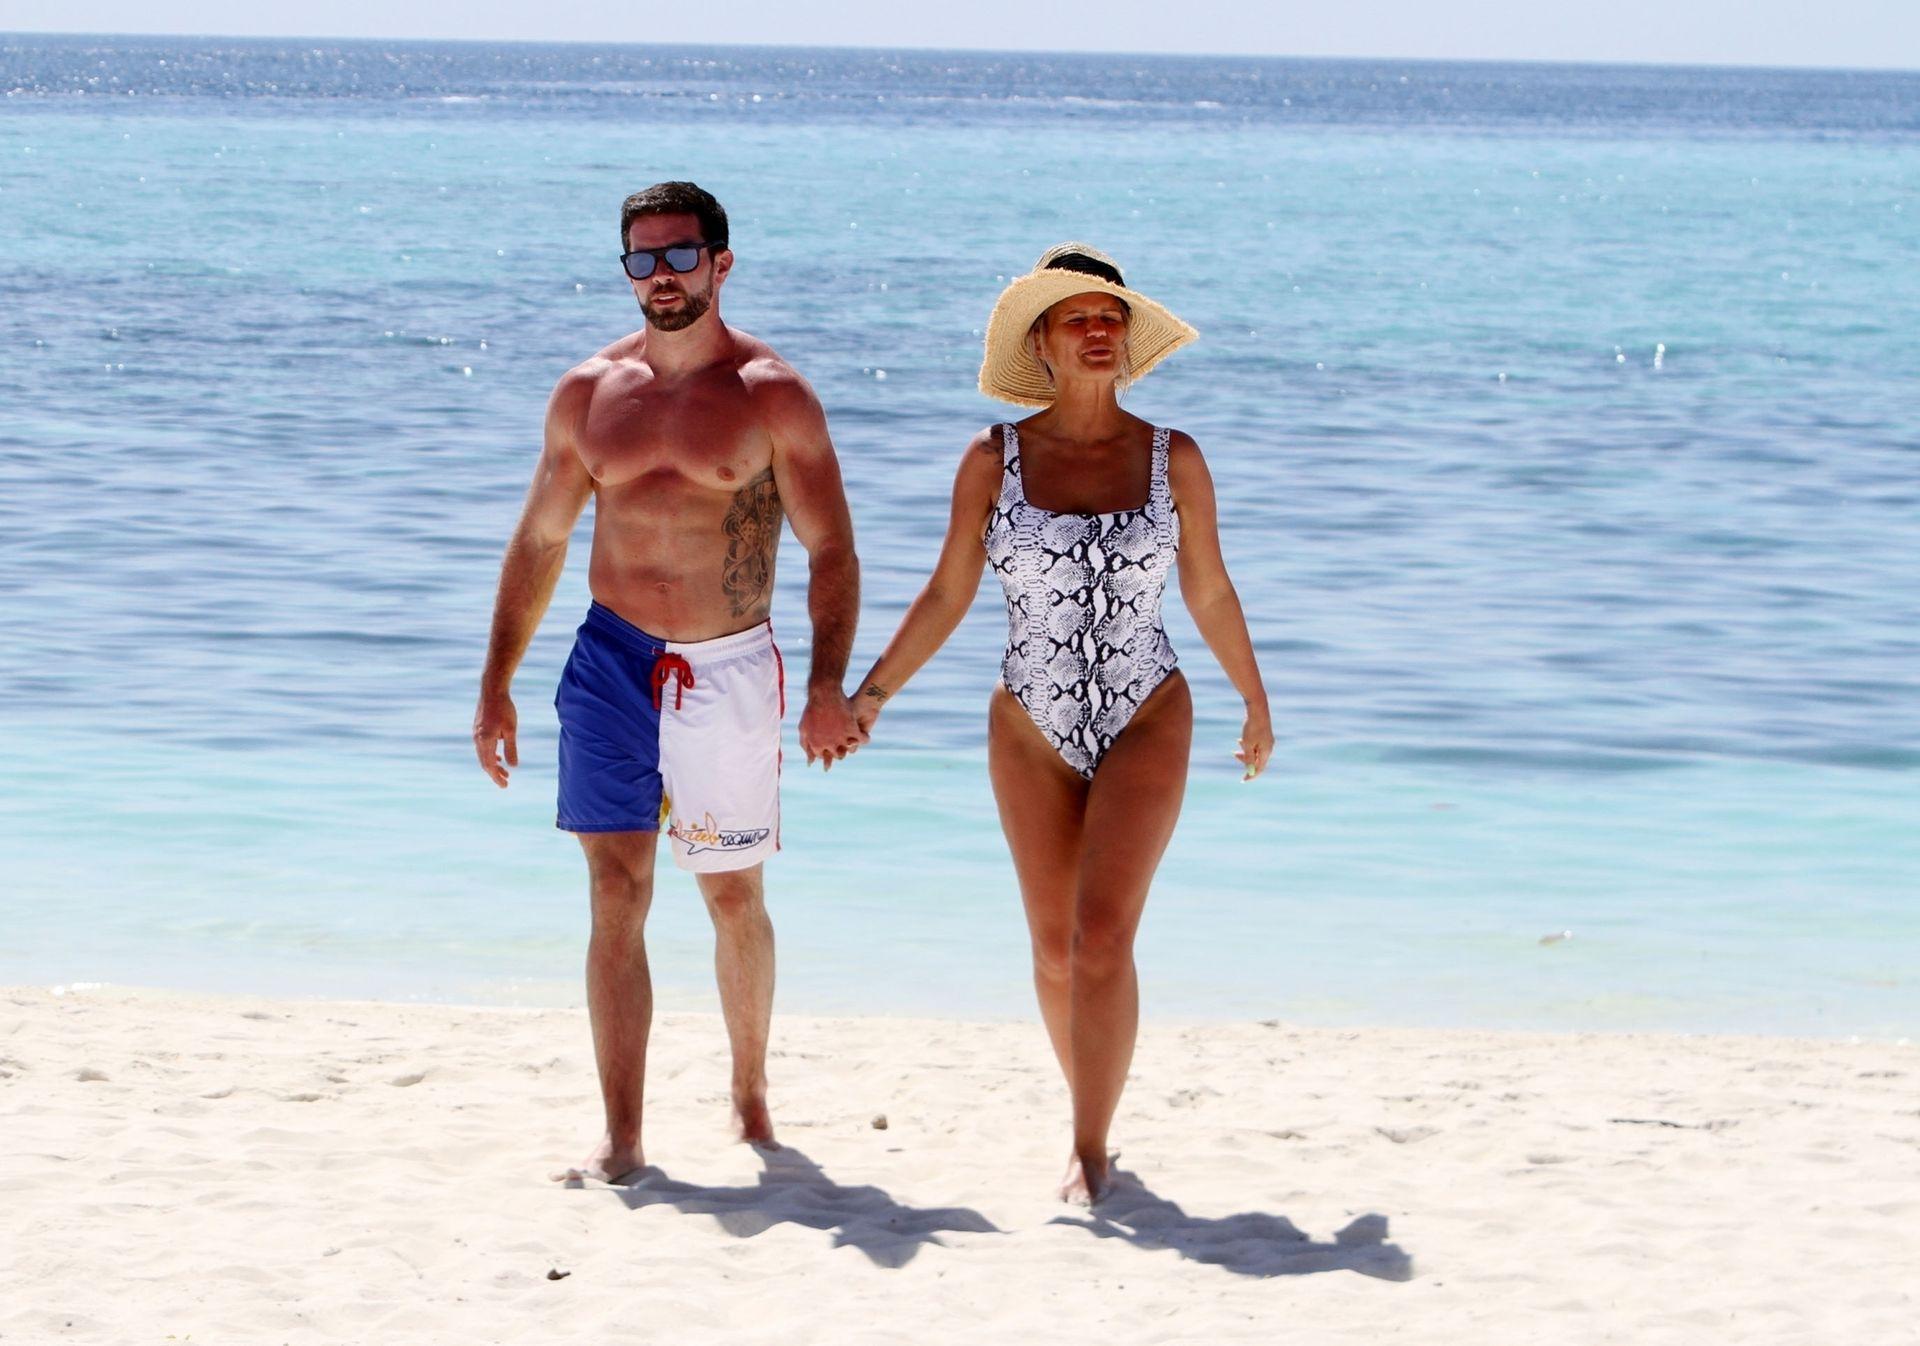 Kerry Katona & Ryan Mahoney Hit The Beach On Holiday At Their Luxury 5 Star Resort Ayada Maldives 0002